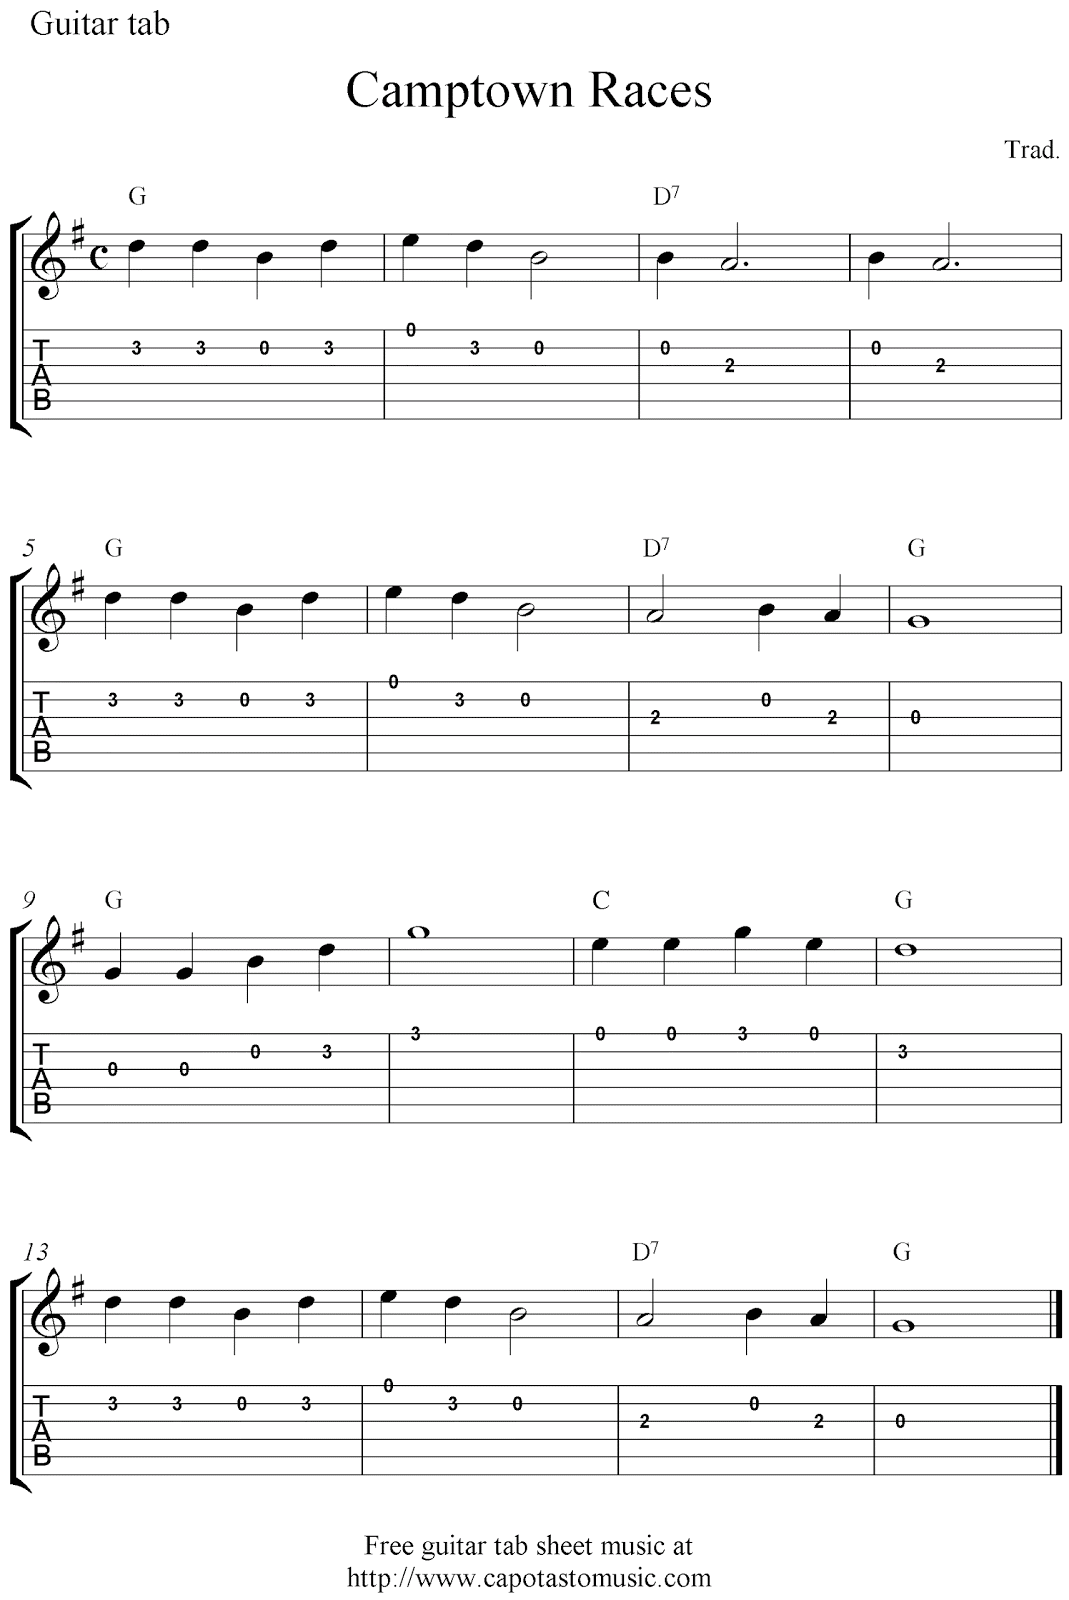 Guitar happy birthday chords choice image guitar chords examples boston amanda guitar chords image collections guitar chords examples happy birthday chords on guitar images guitar hexwebz Gallery